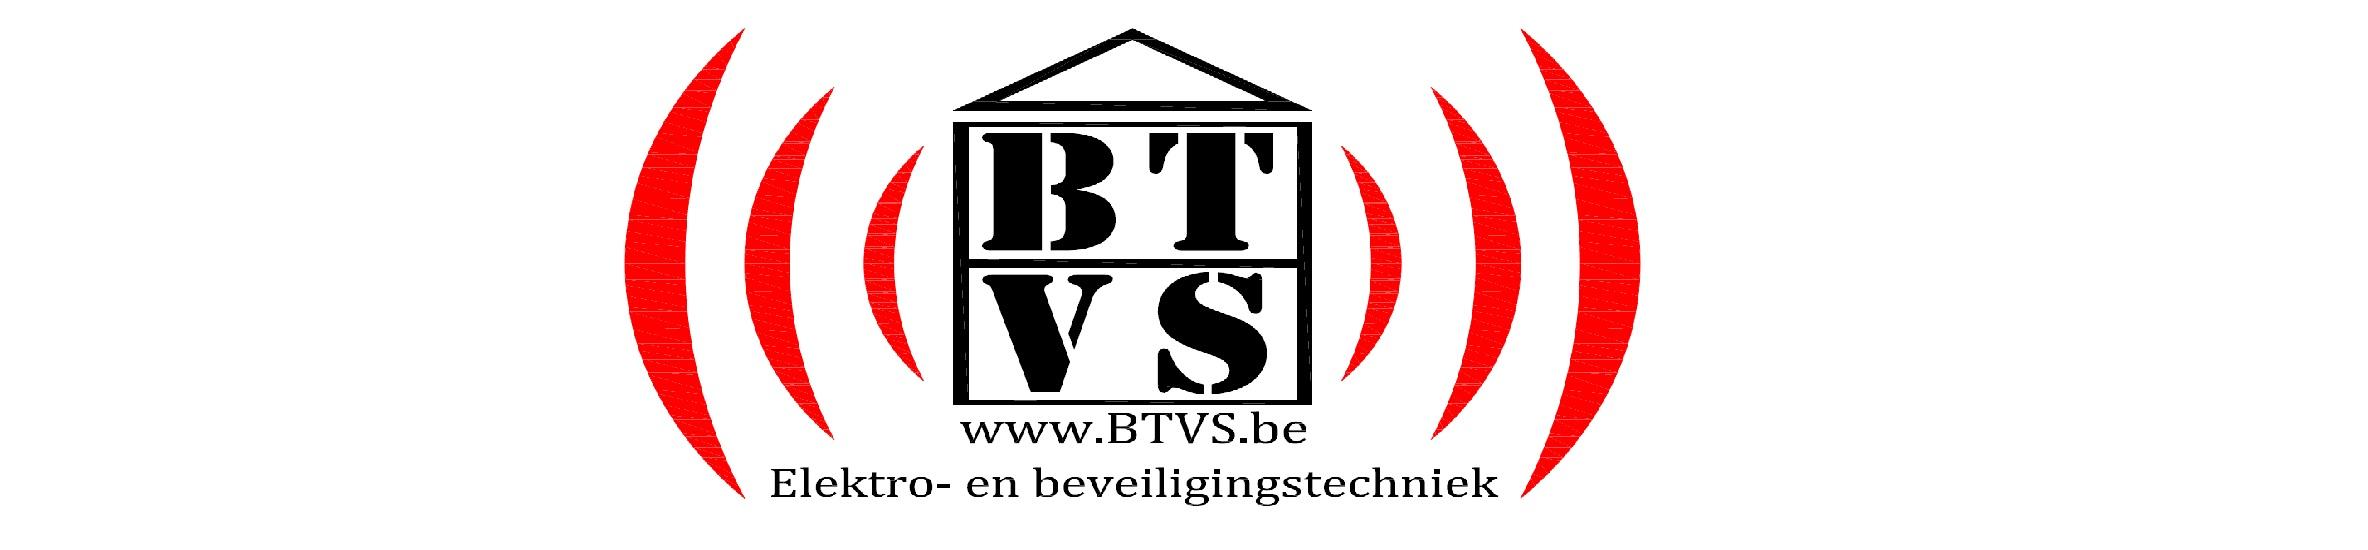 BTVS reclame